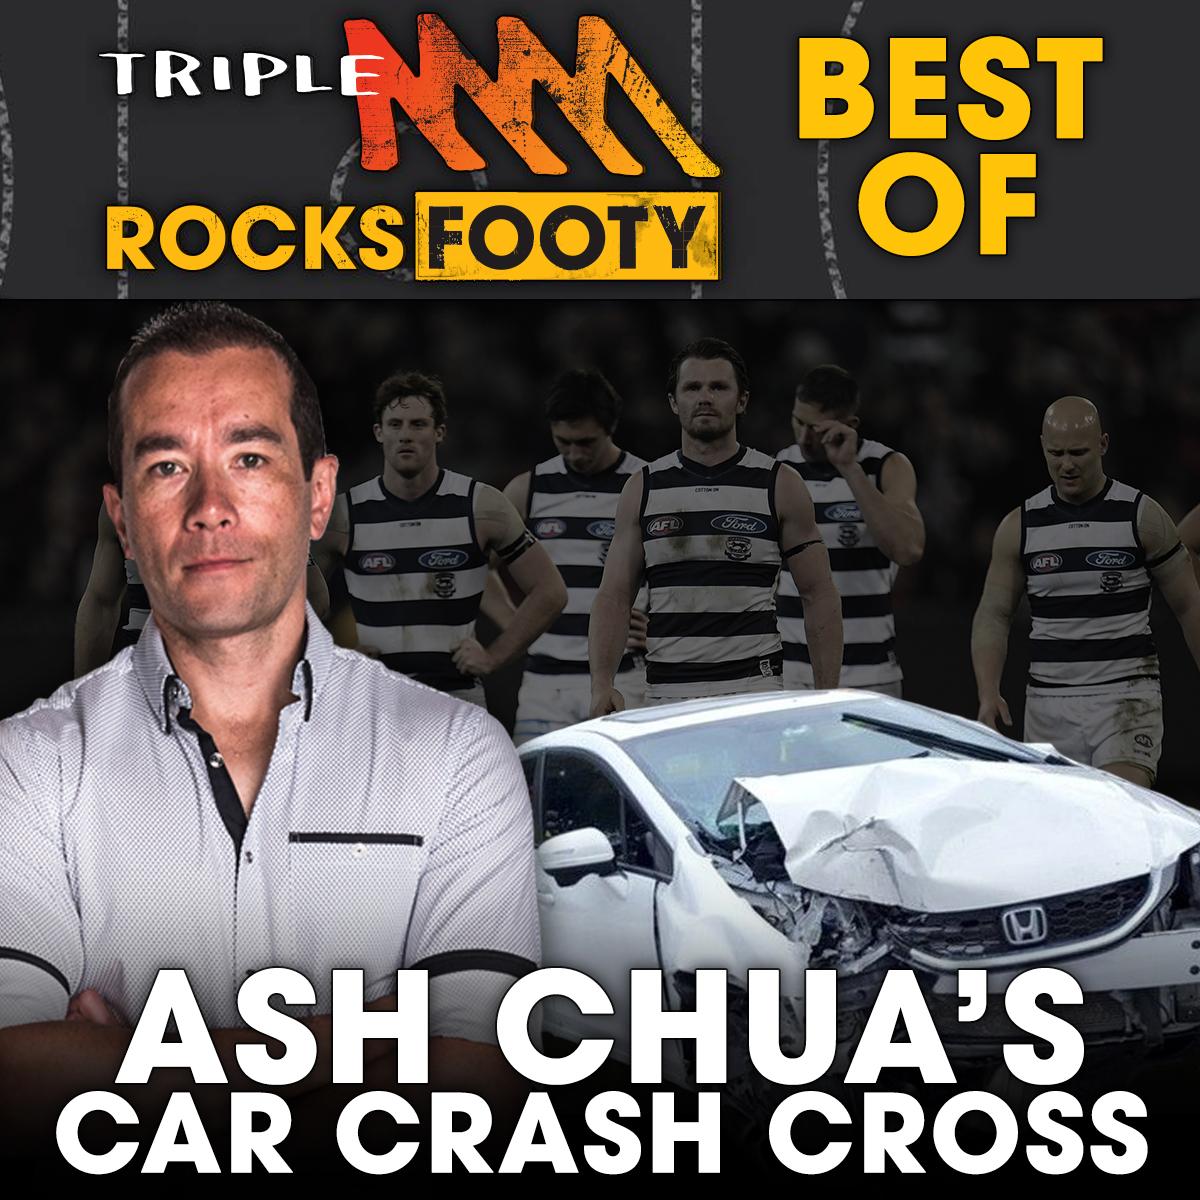 Ash Chua's Car Crash Cross From The Geelong Rooms